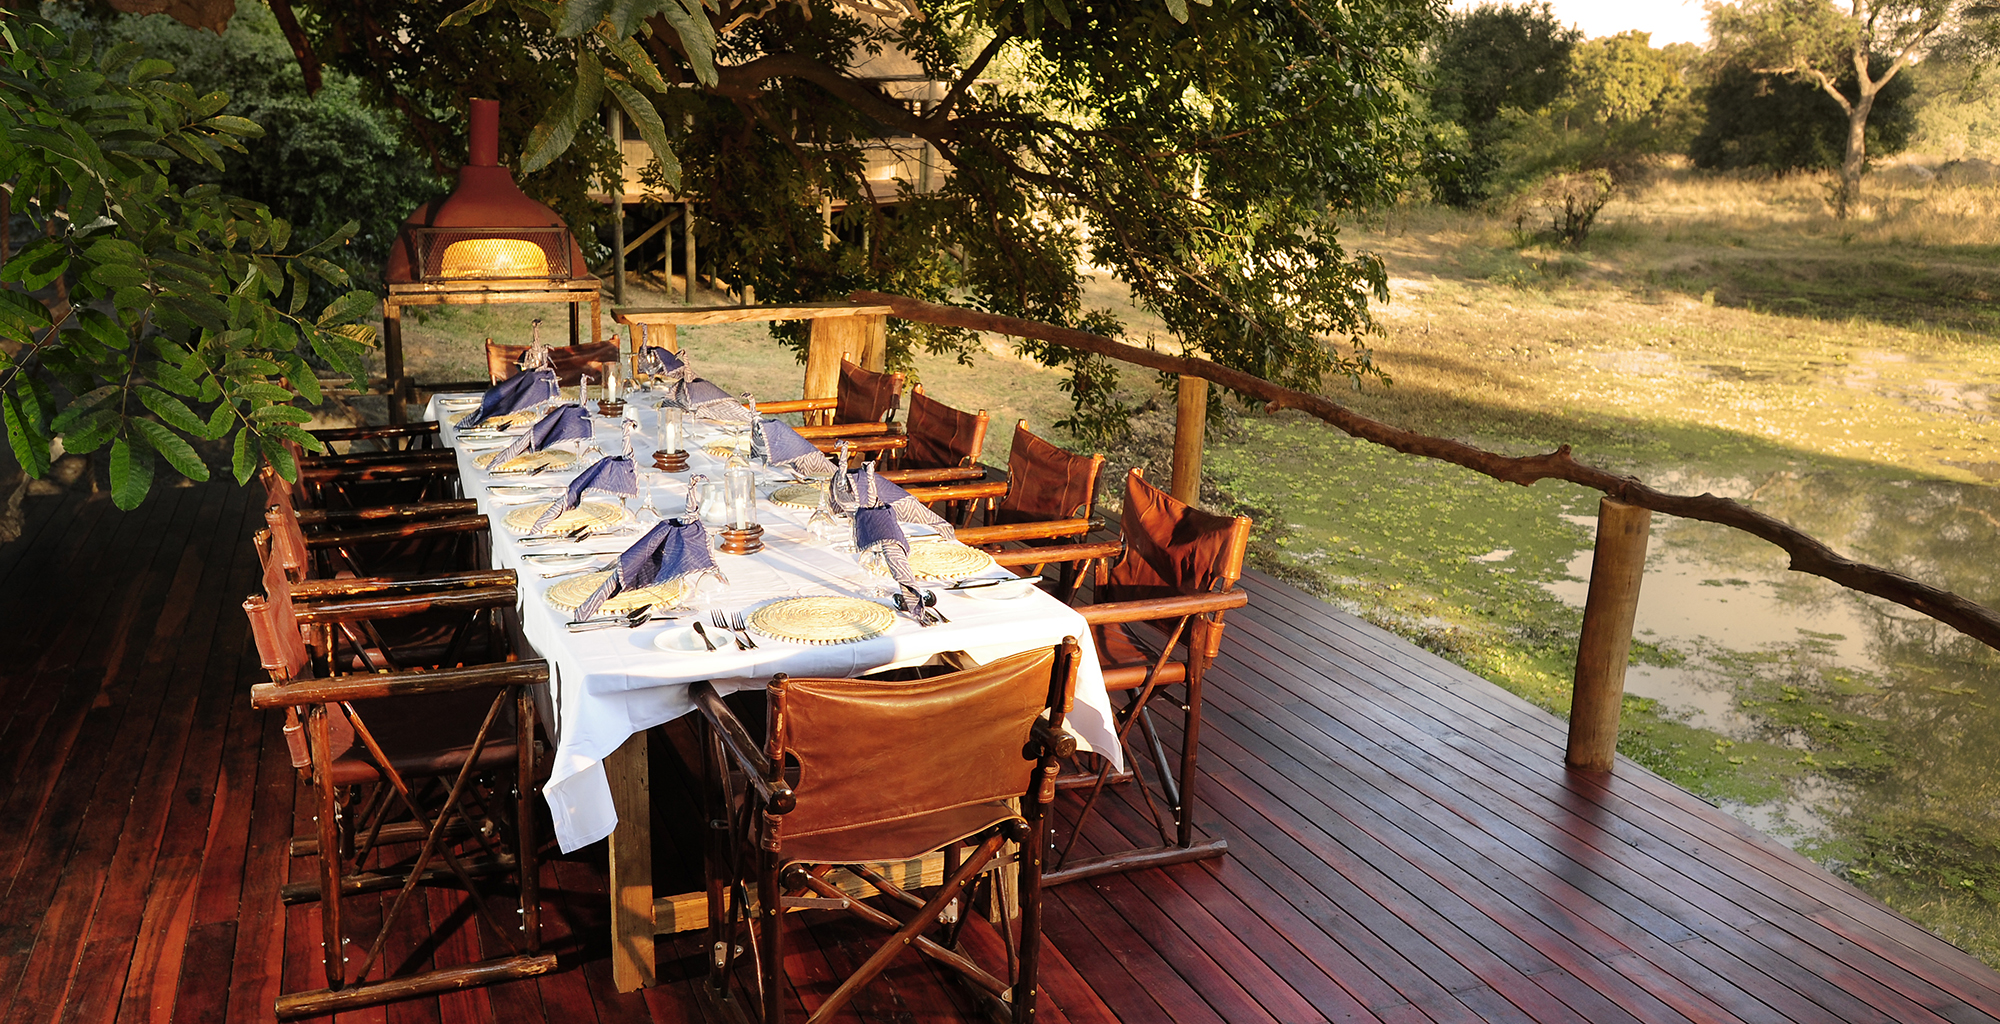 Zambia-Bilimungwe-Bushcamp-Dining